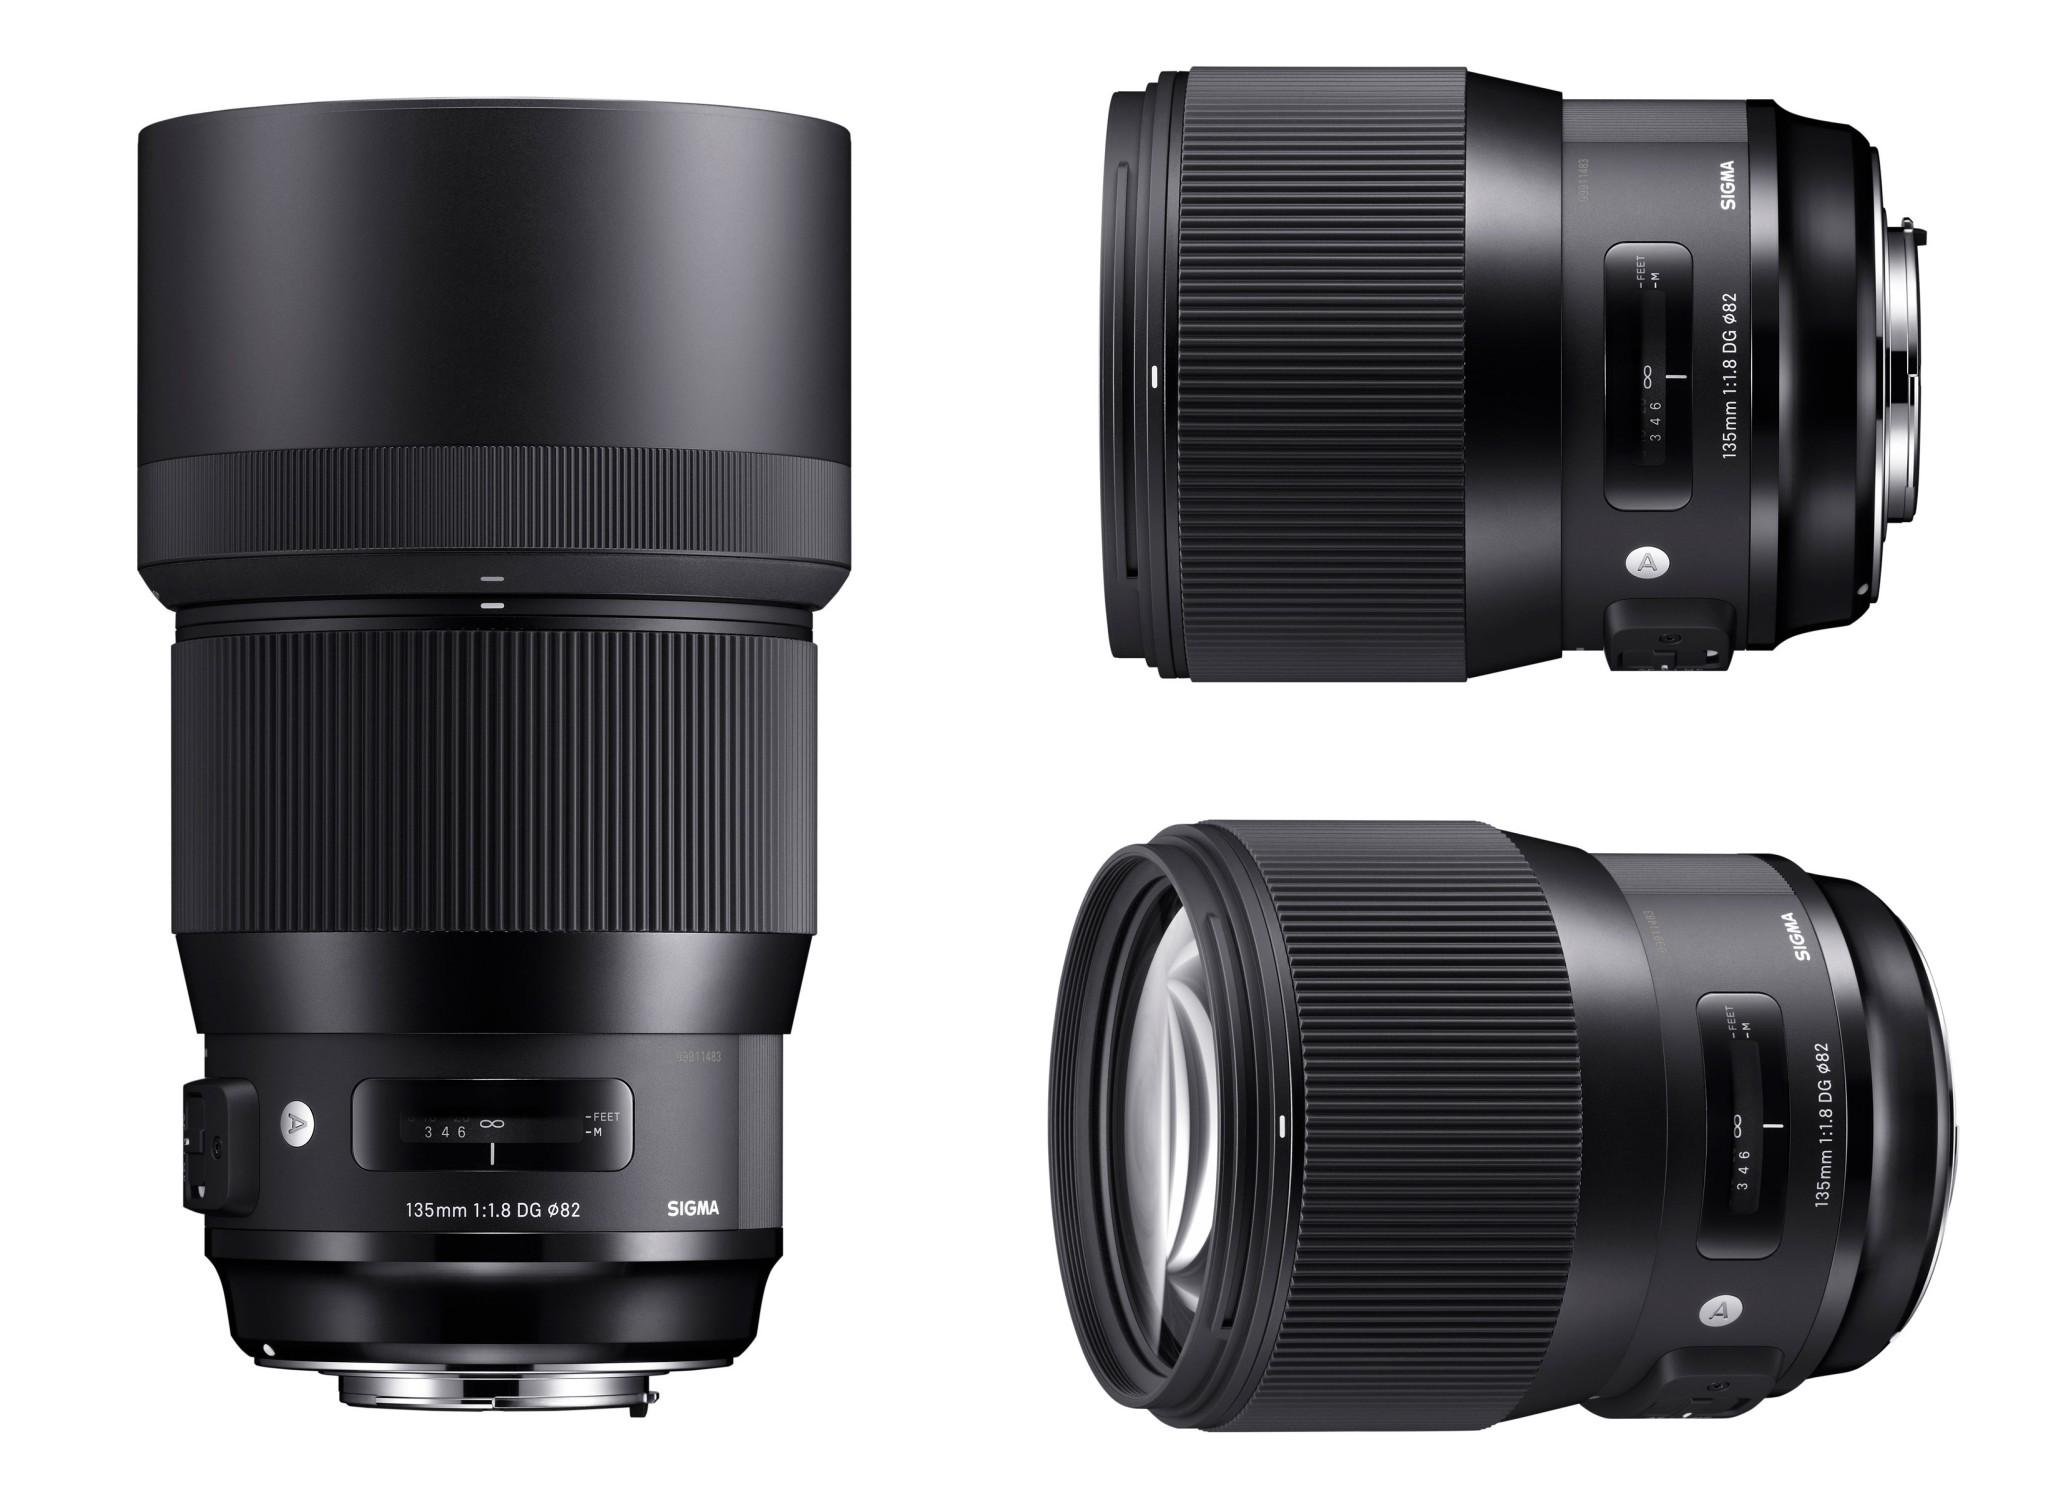 Sigma 135mm F1.8 art camera.tinhte.vn.jpg